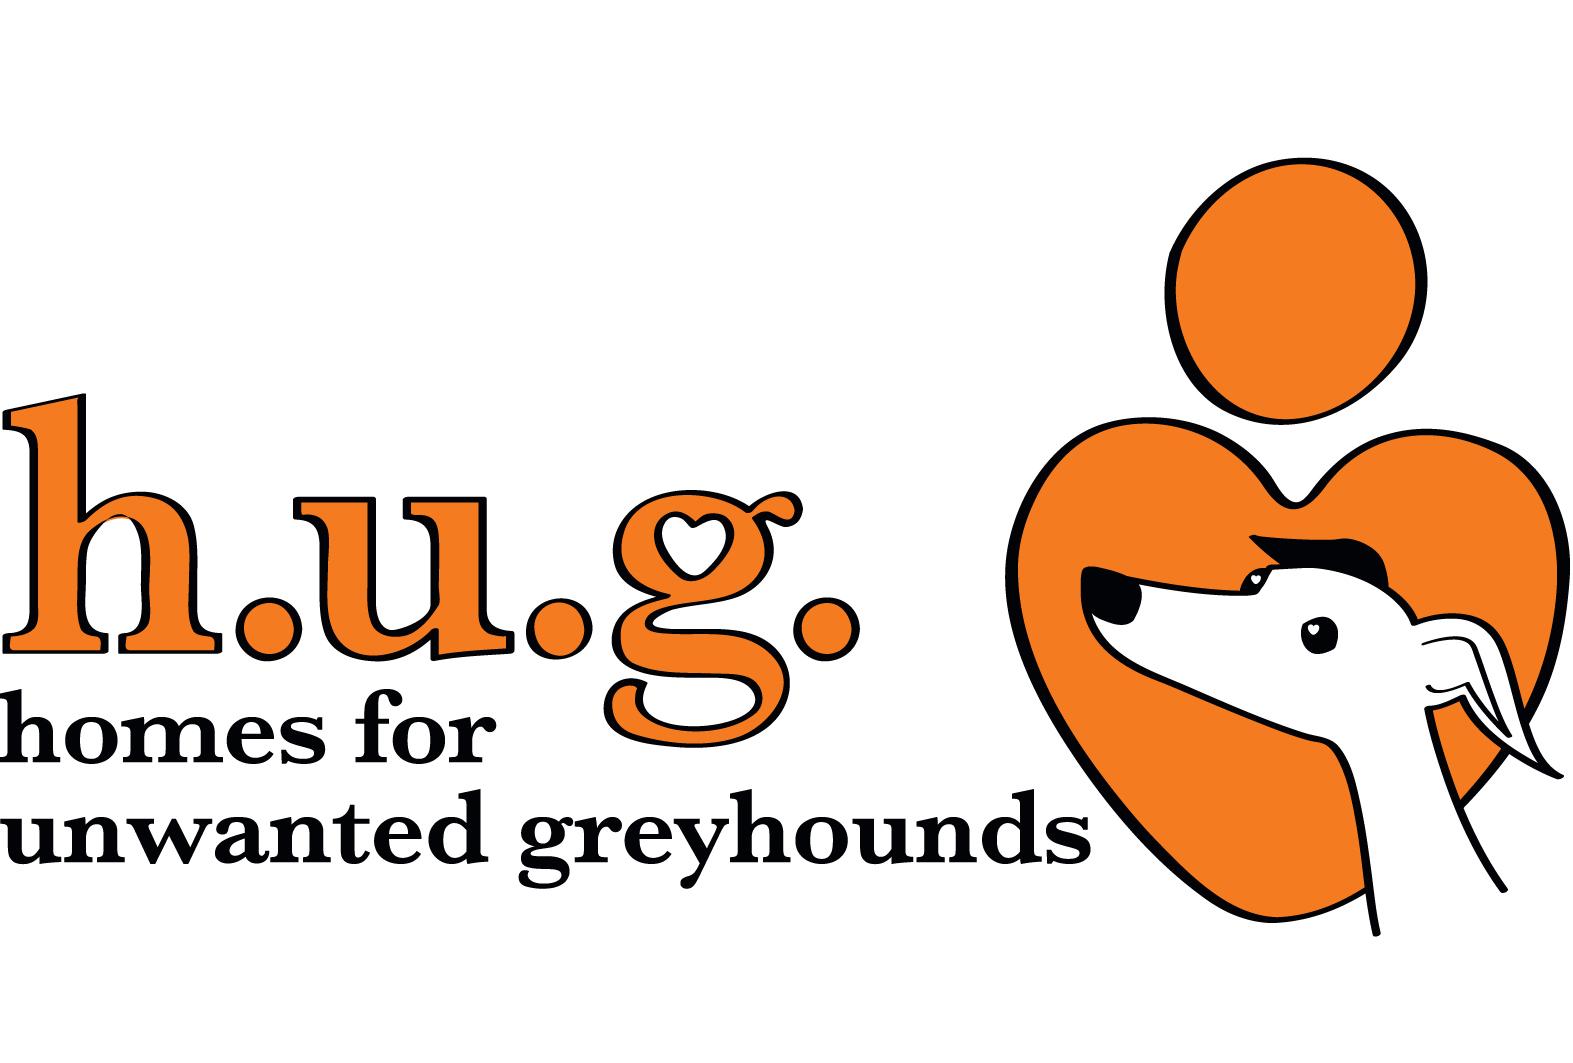 Re-branding a Rescue